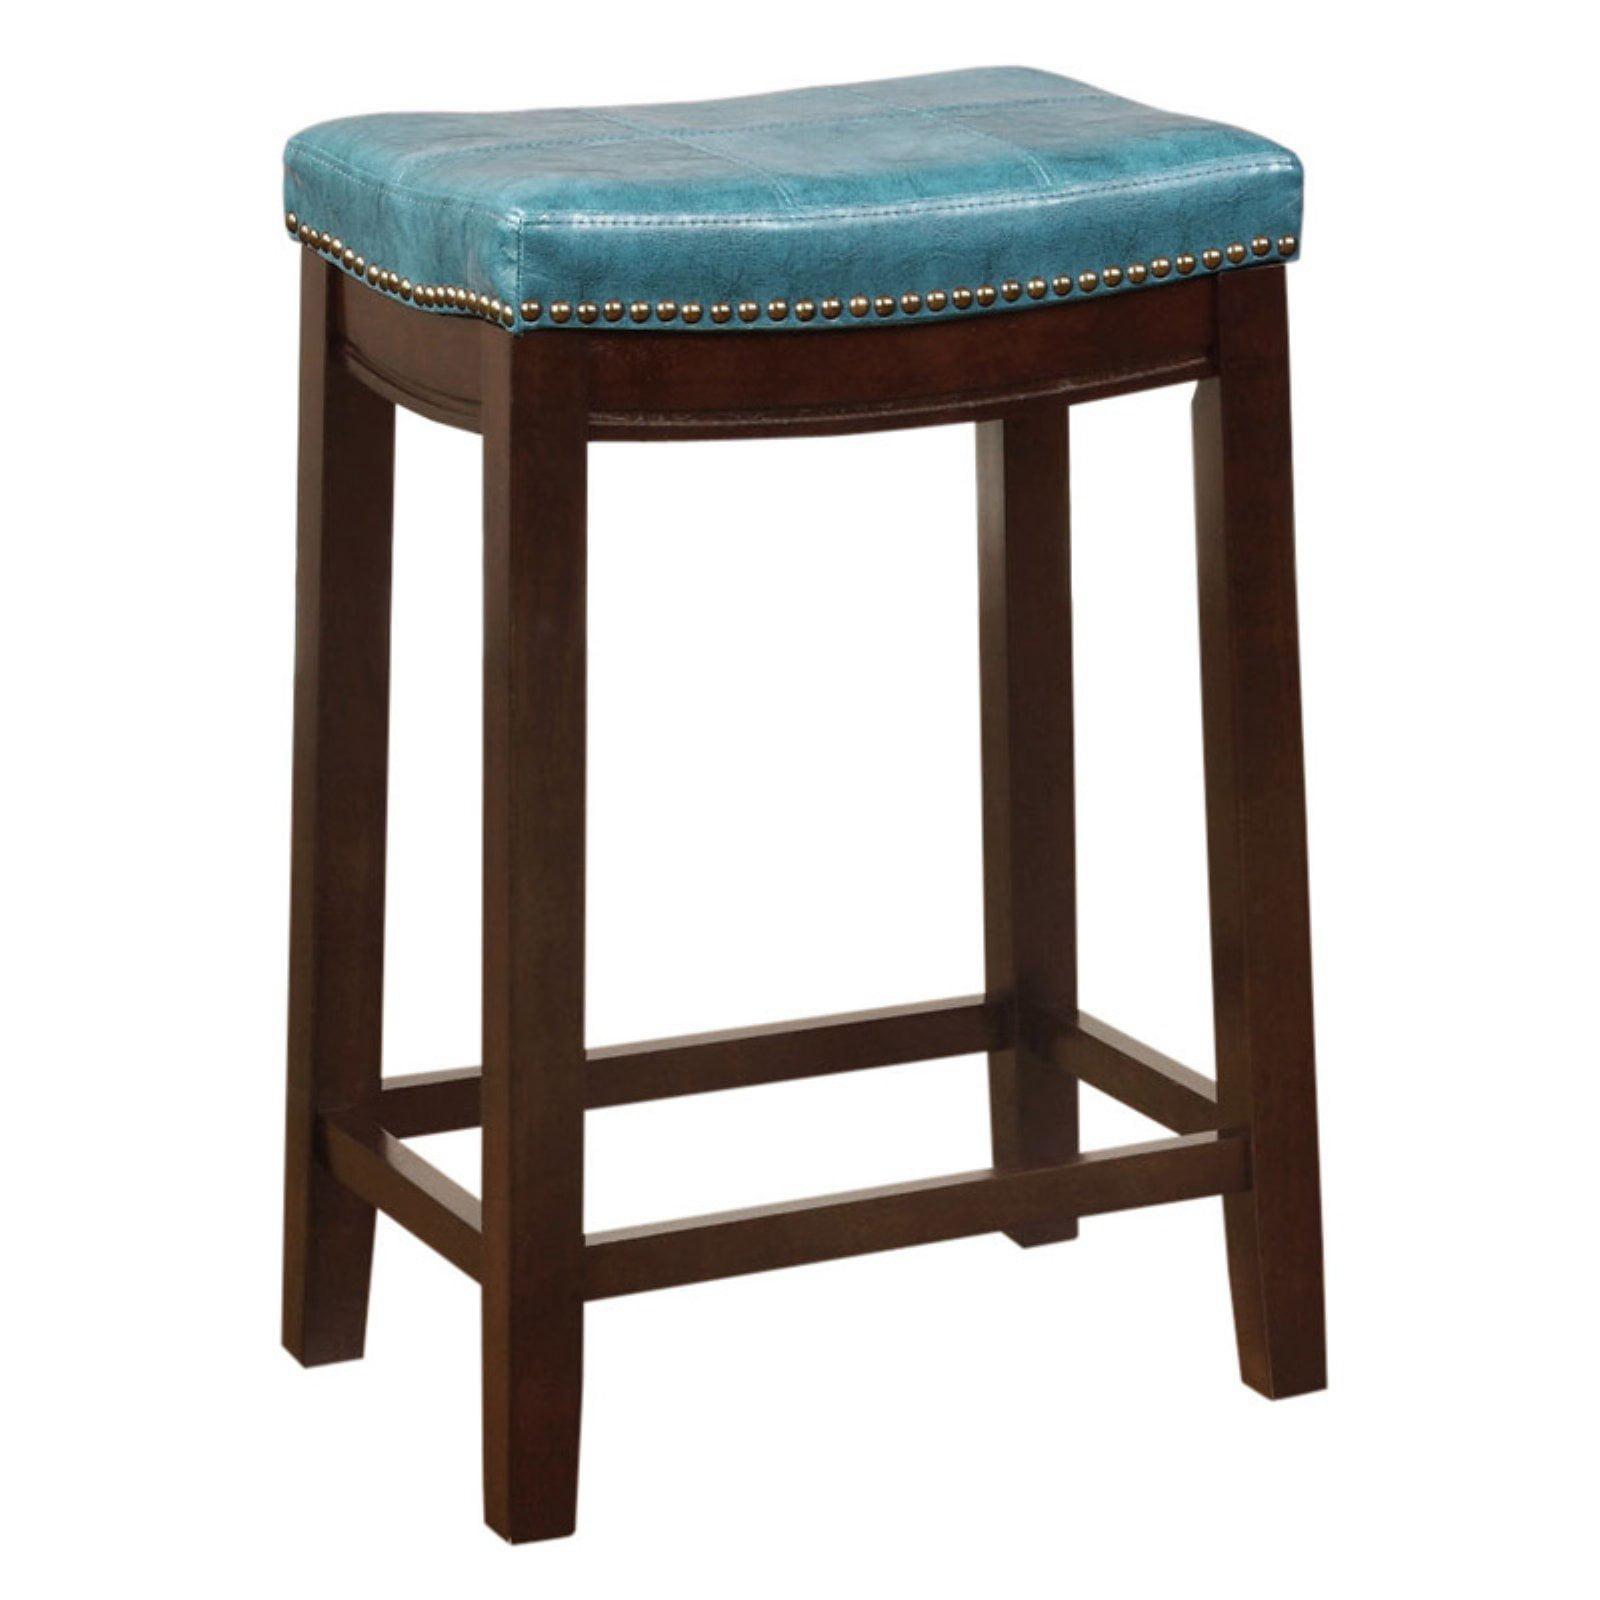 Linon Claridge Backless Counter Stool 24 Inch Seat Height